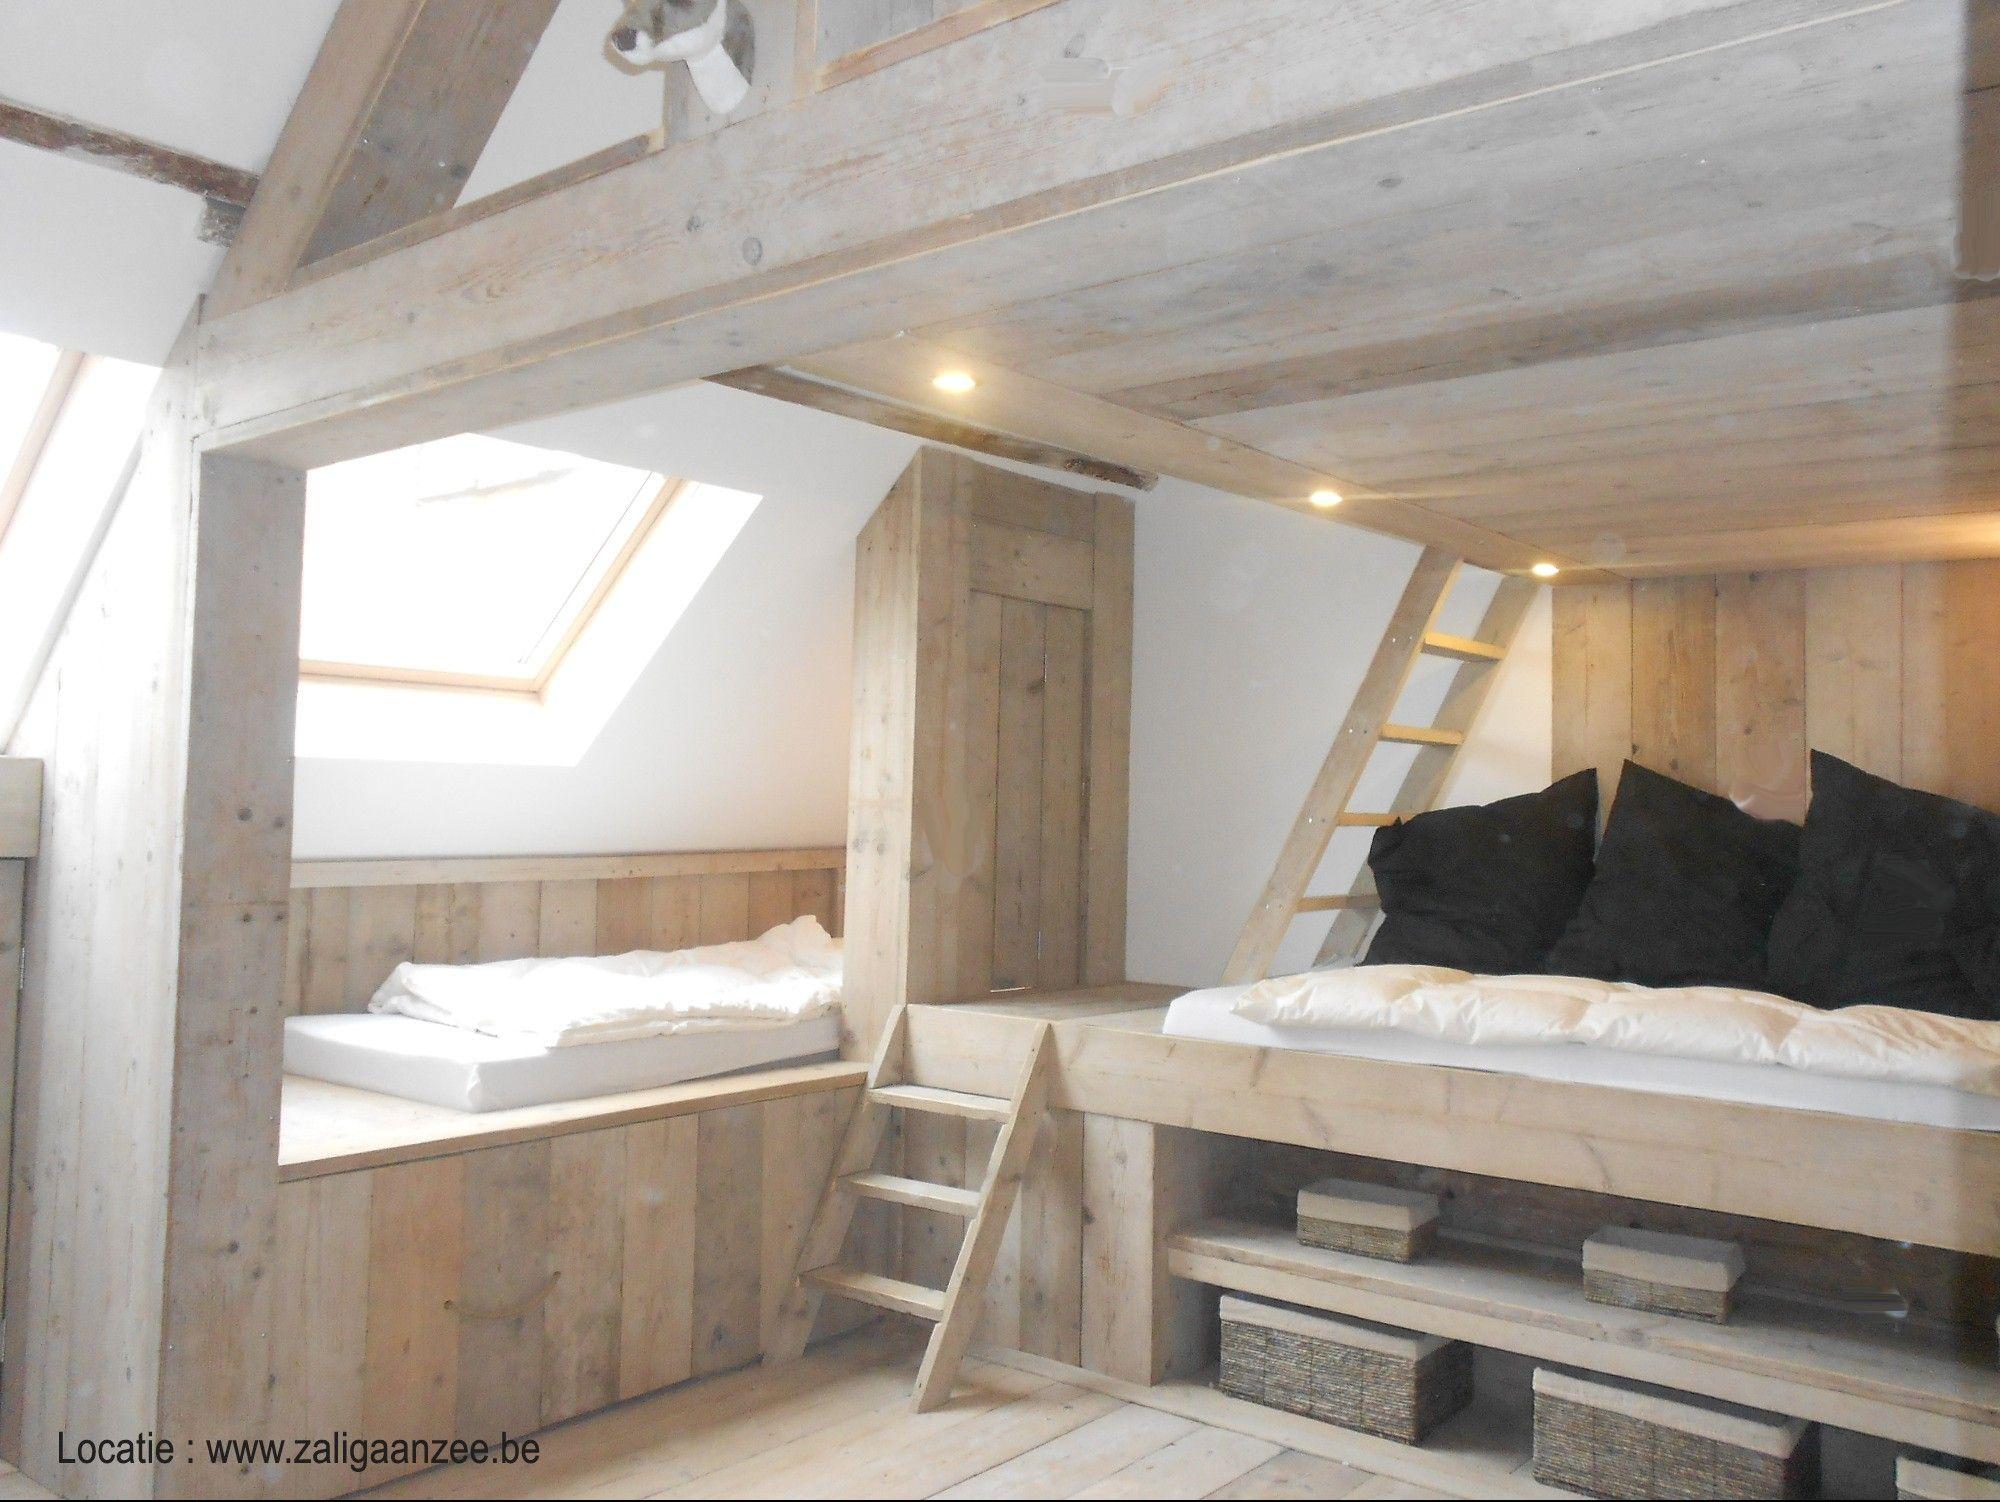 Kinderkamers op zolder for the home pinterest slaapzolder